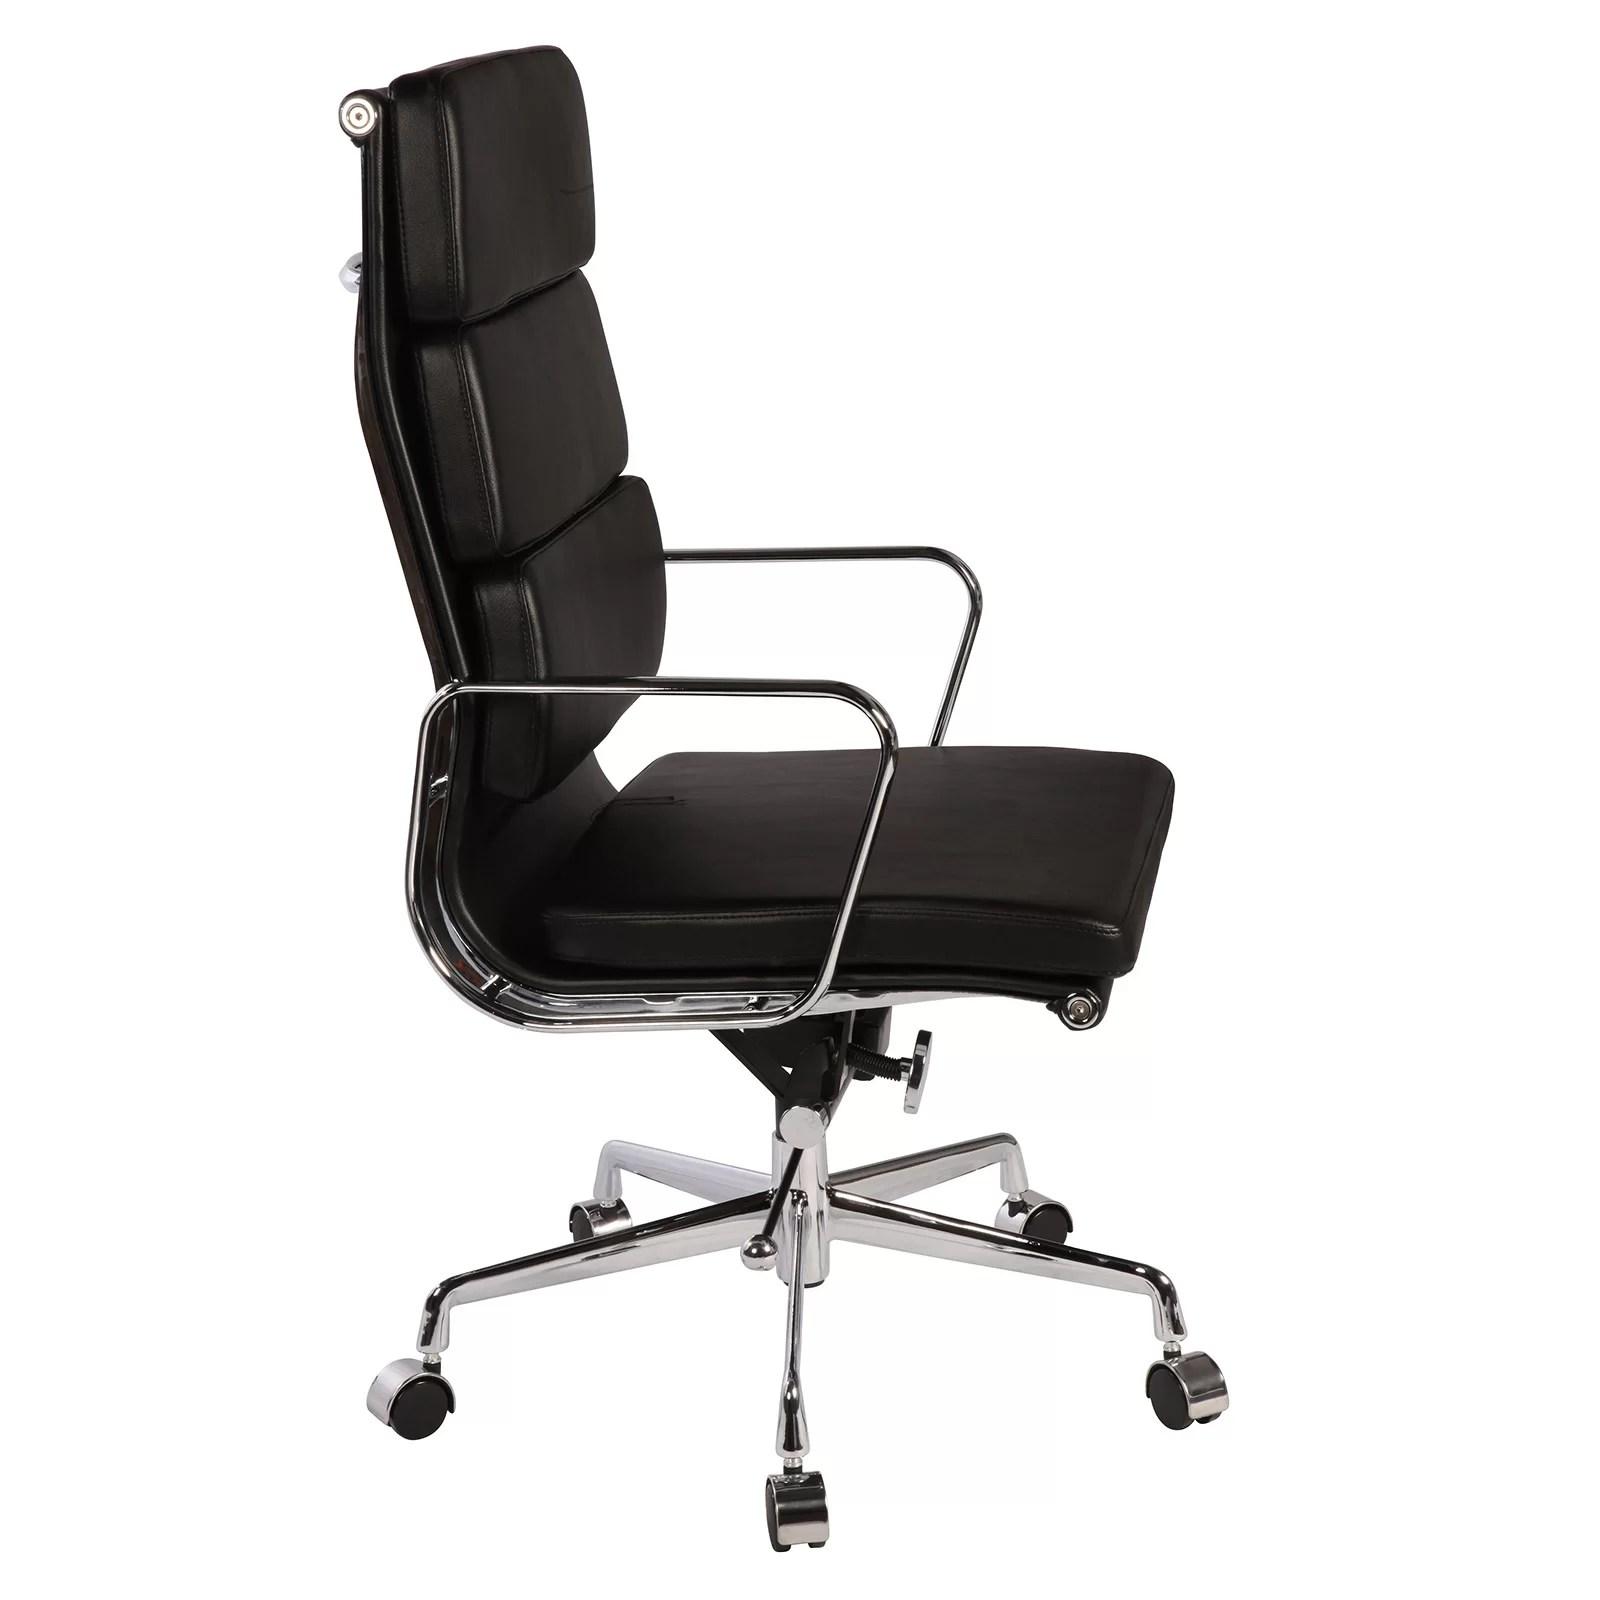 eames leather chair dining covers dubai polivaz replica executive wayfair